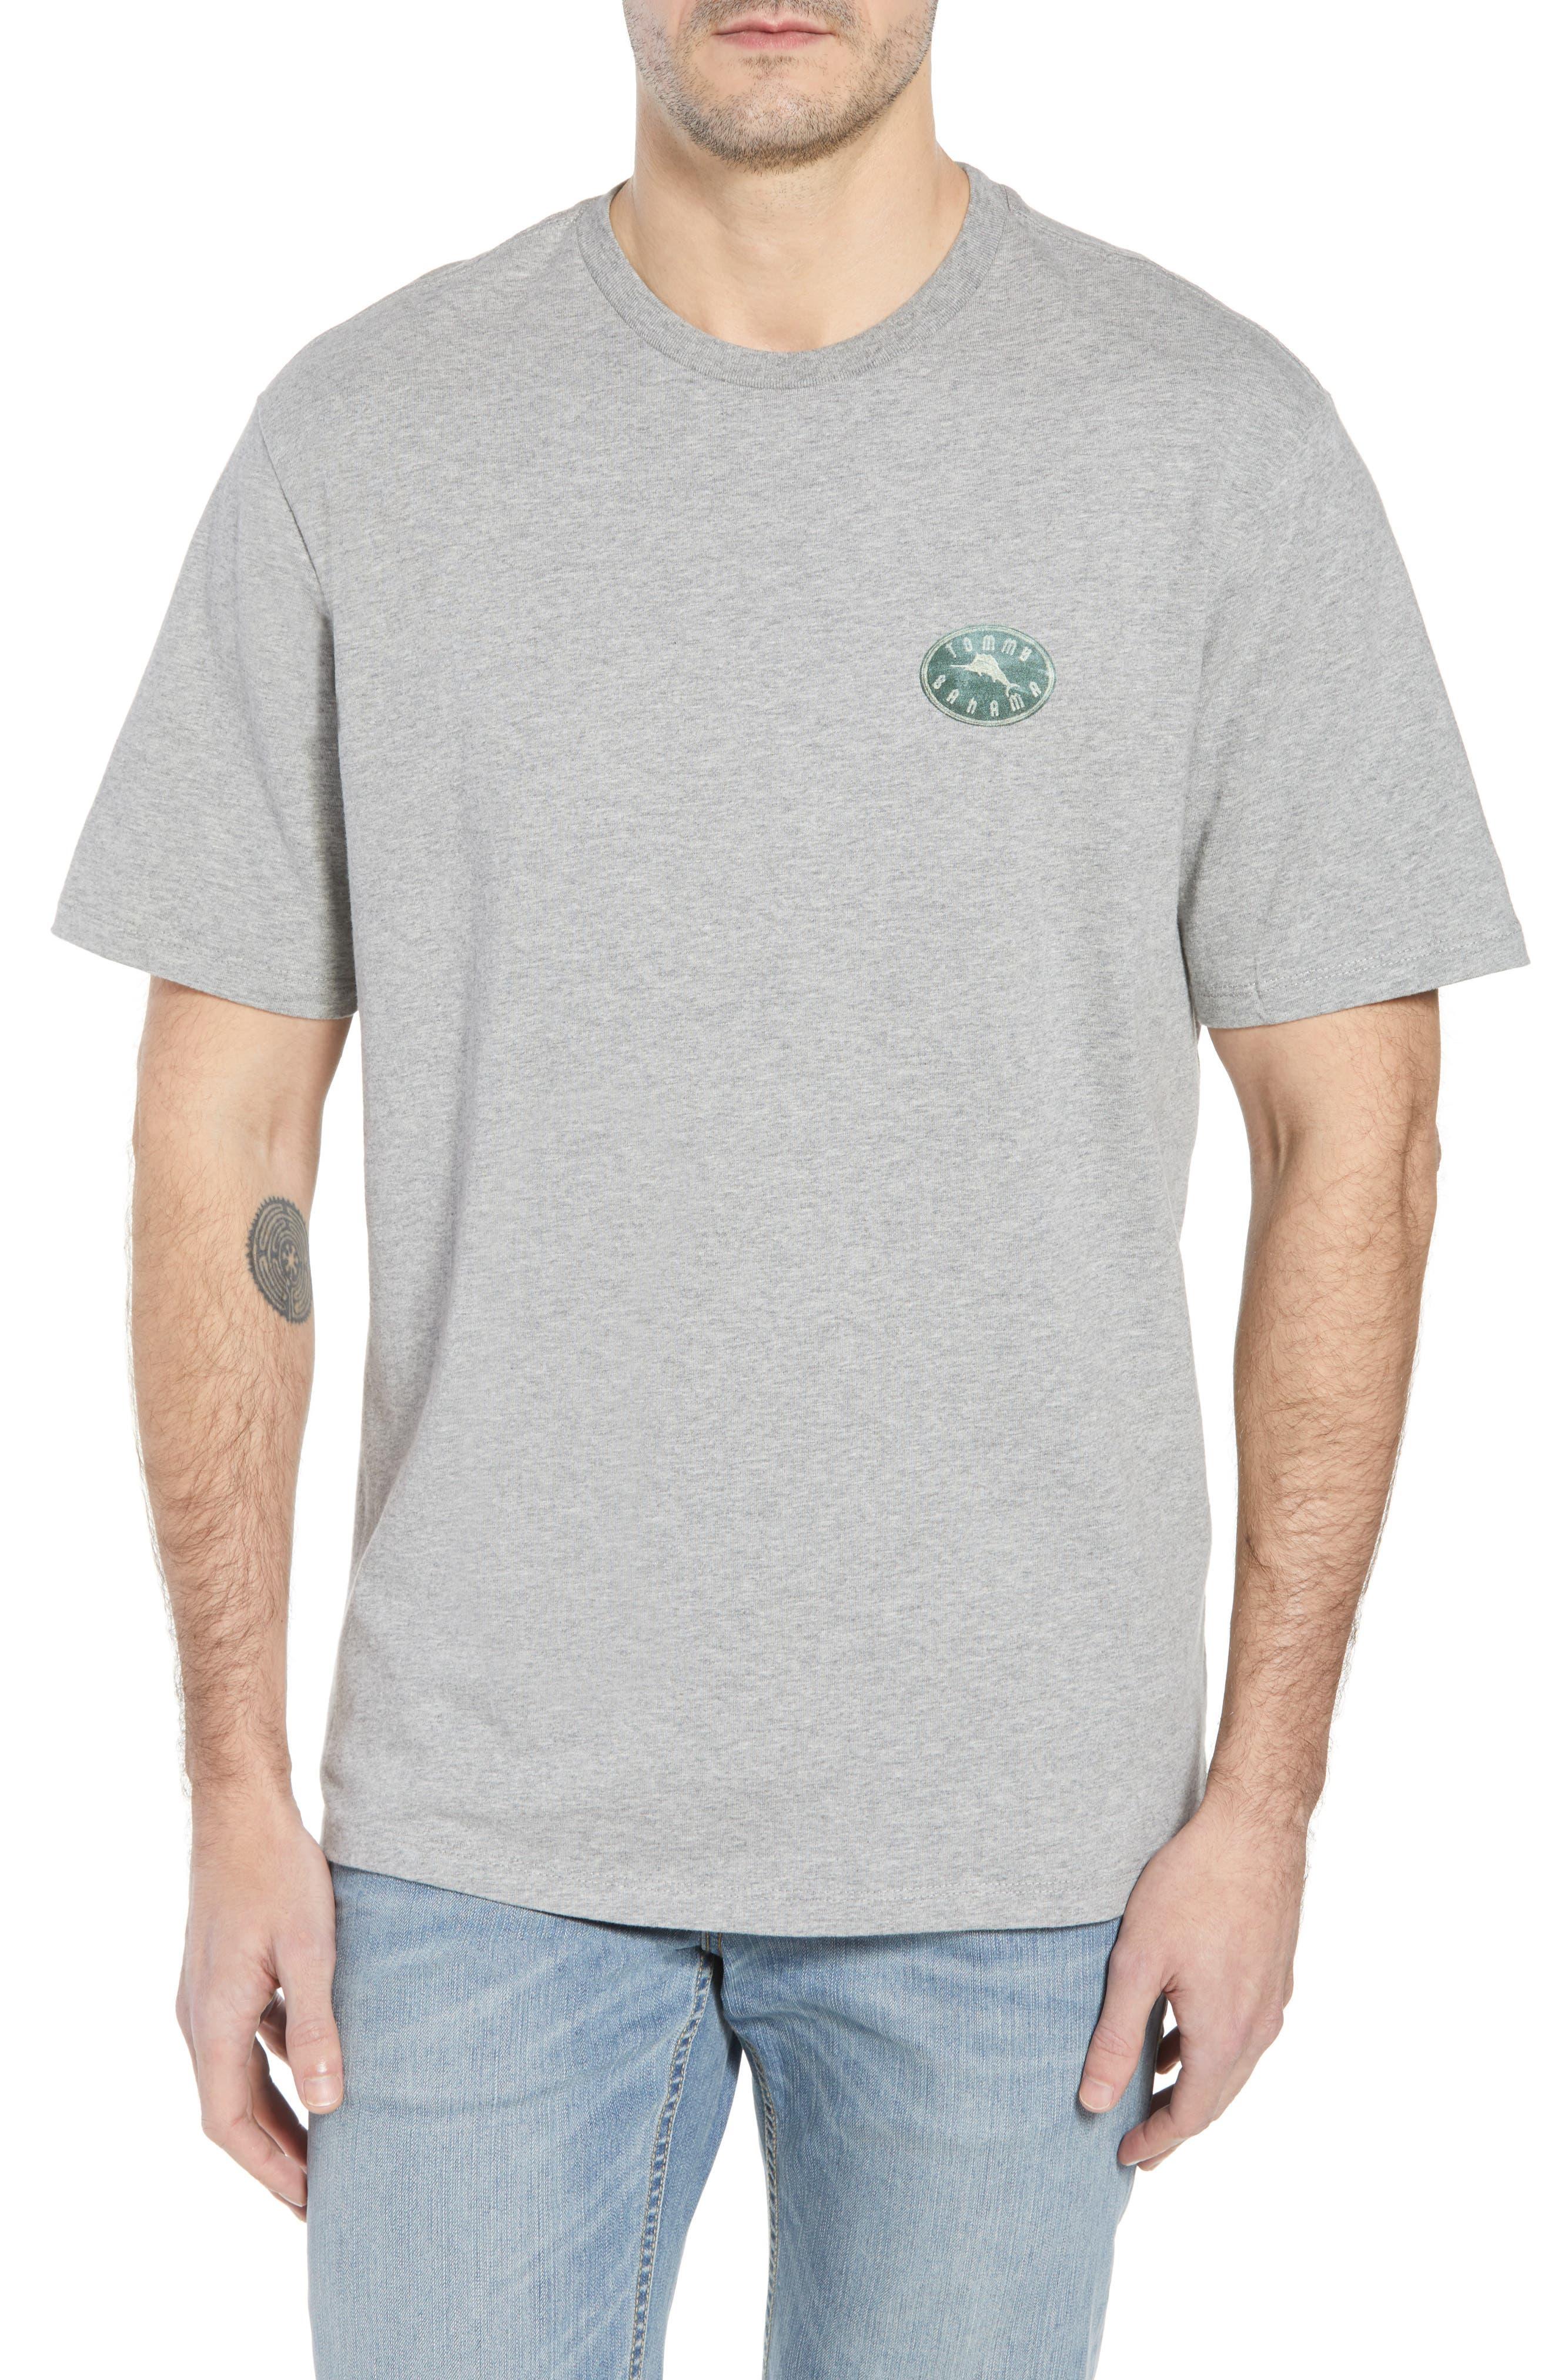 Chalk & Roll T-Shirt,                         Main,                         color, Grey Heather